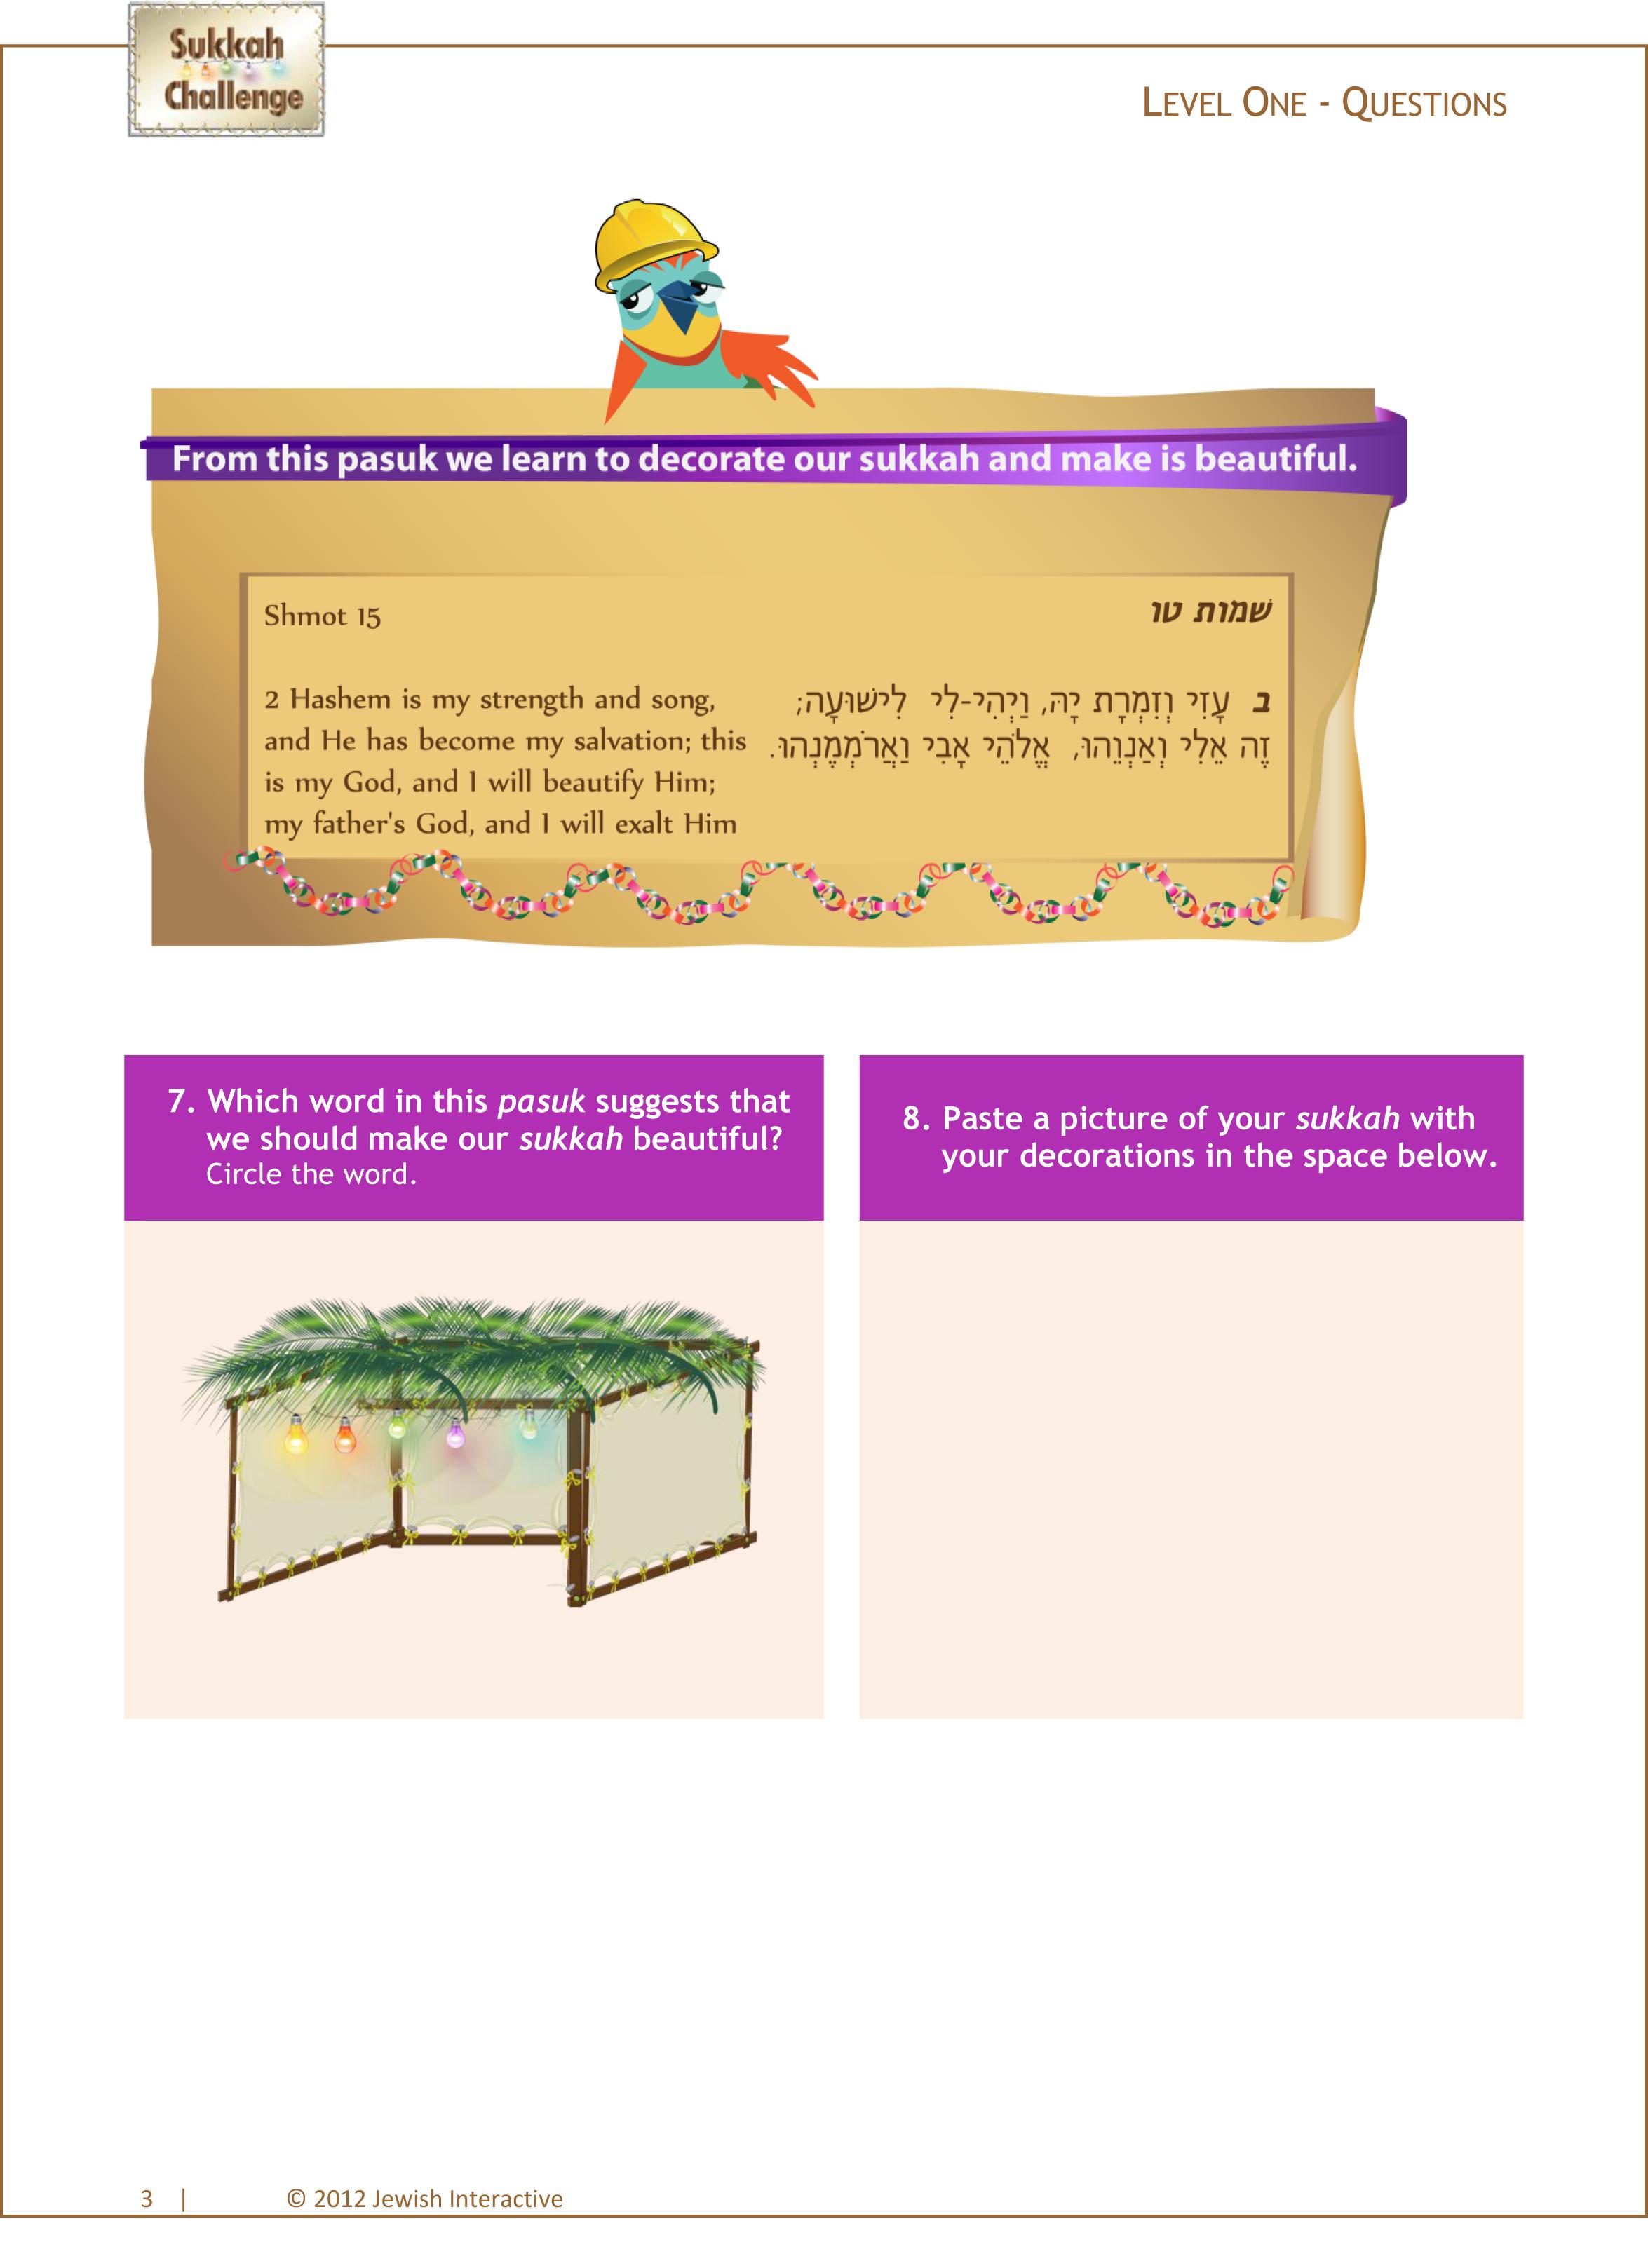 Worksheet - Sukkah - Page 3